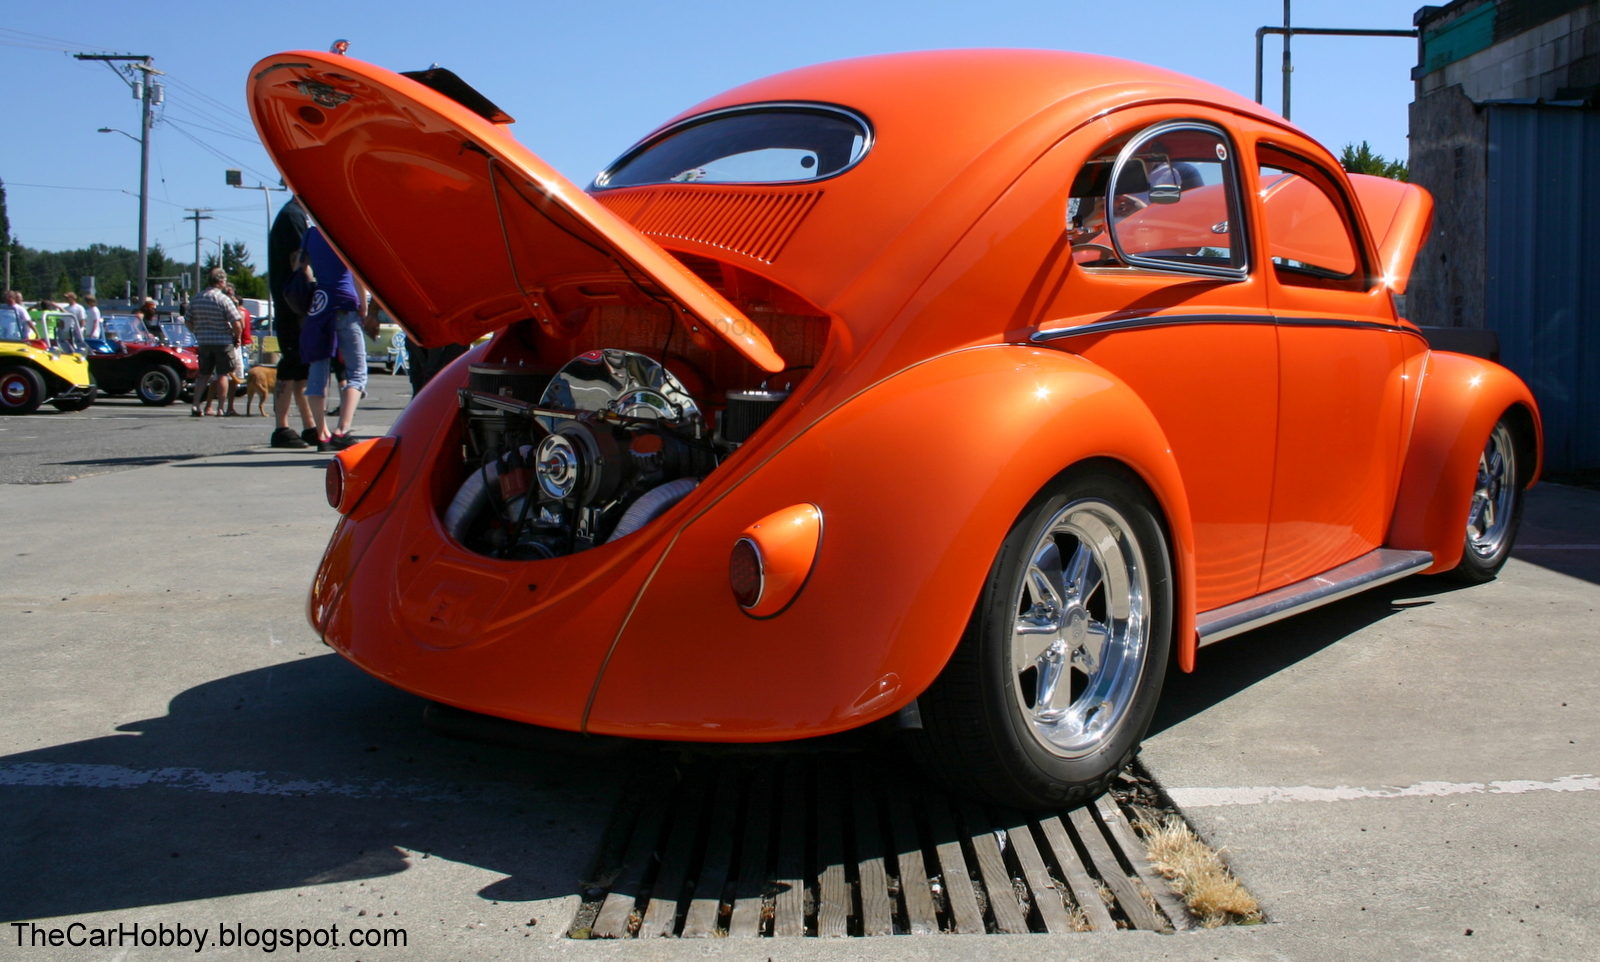 bumpys dubfest  car hobby